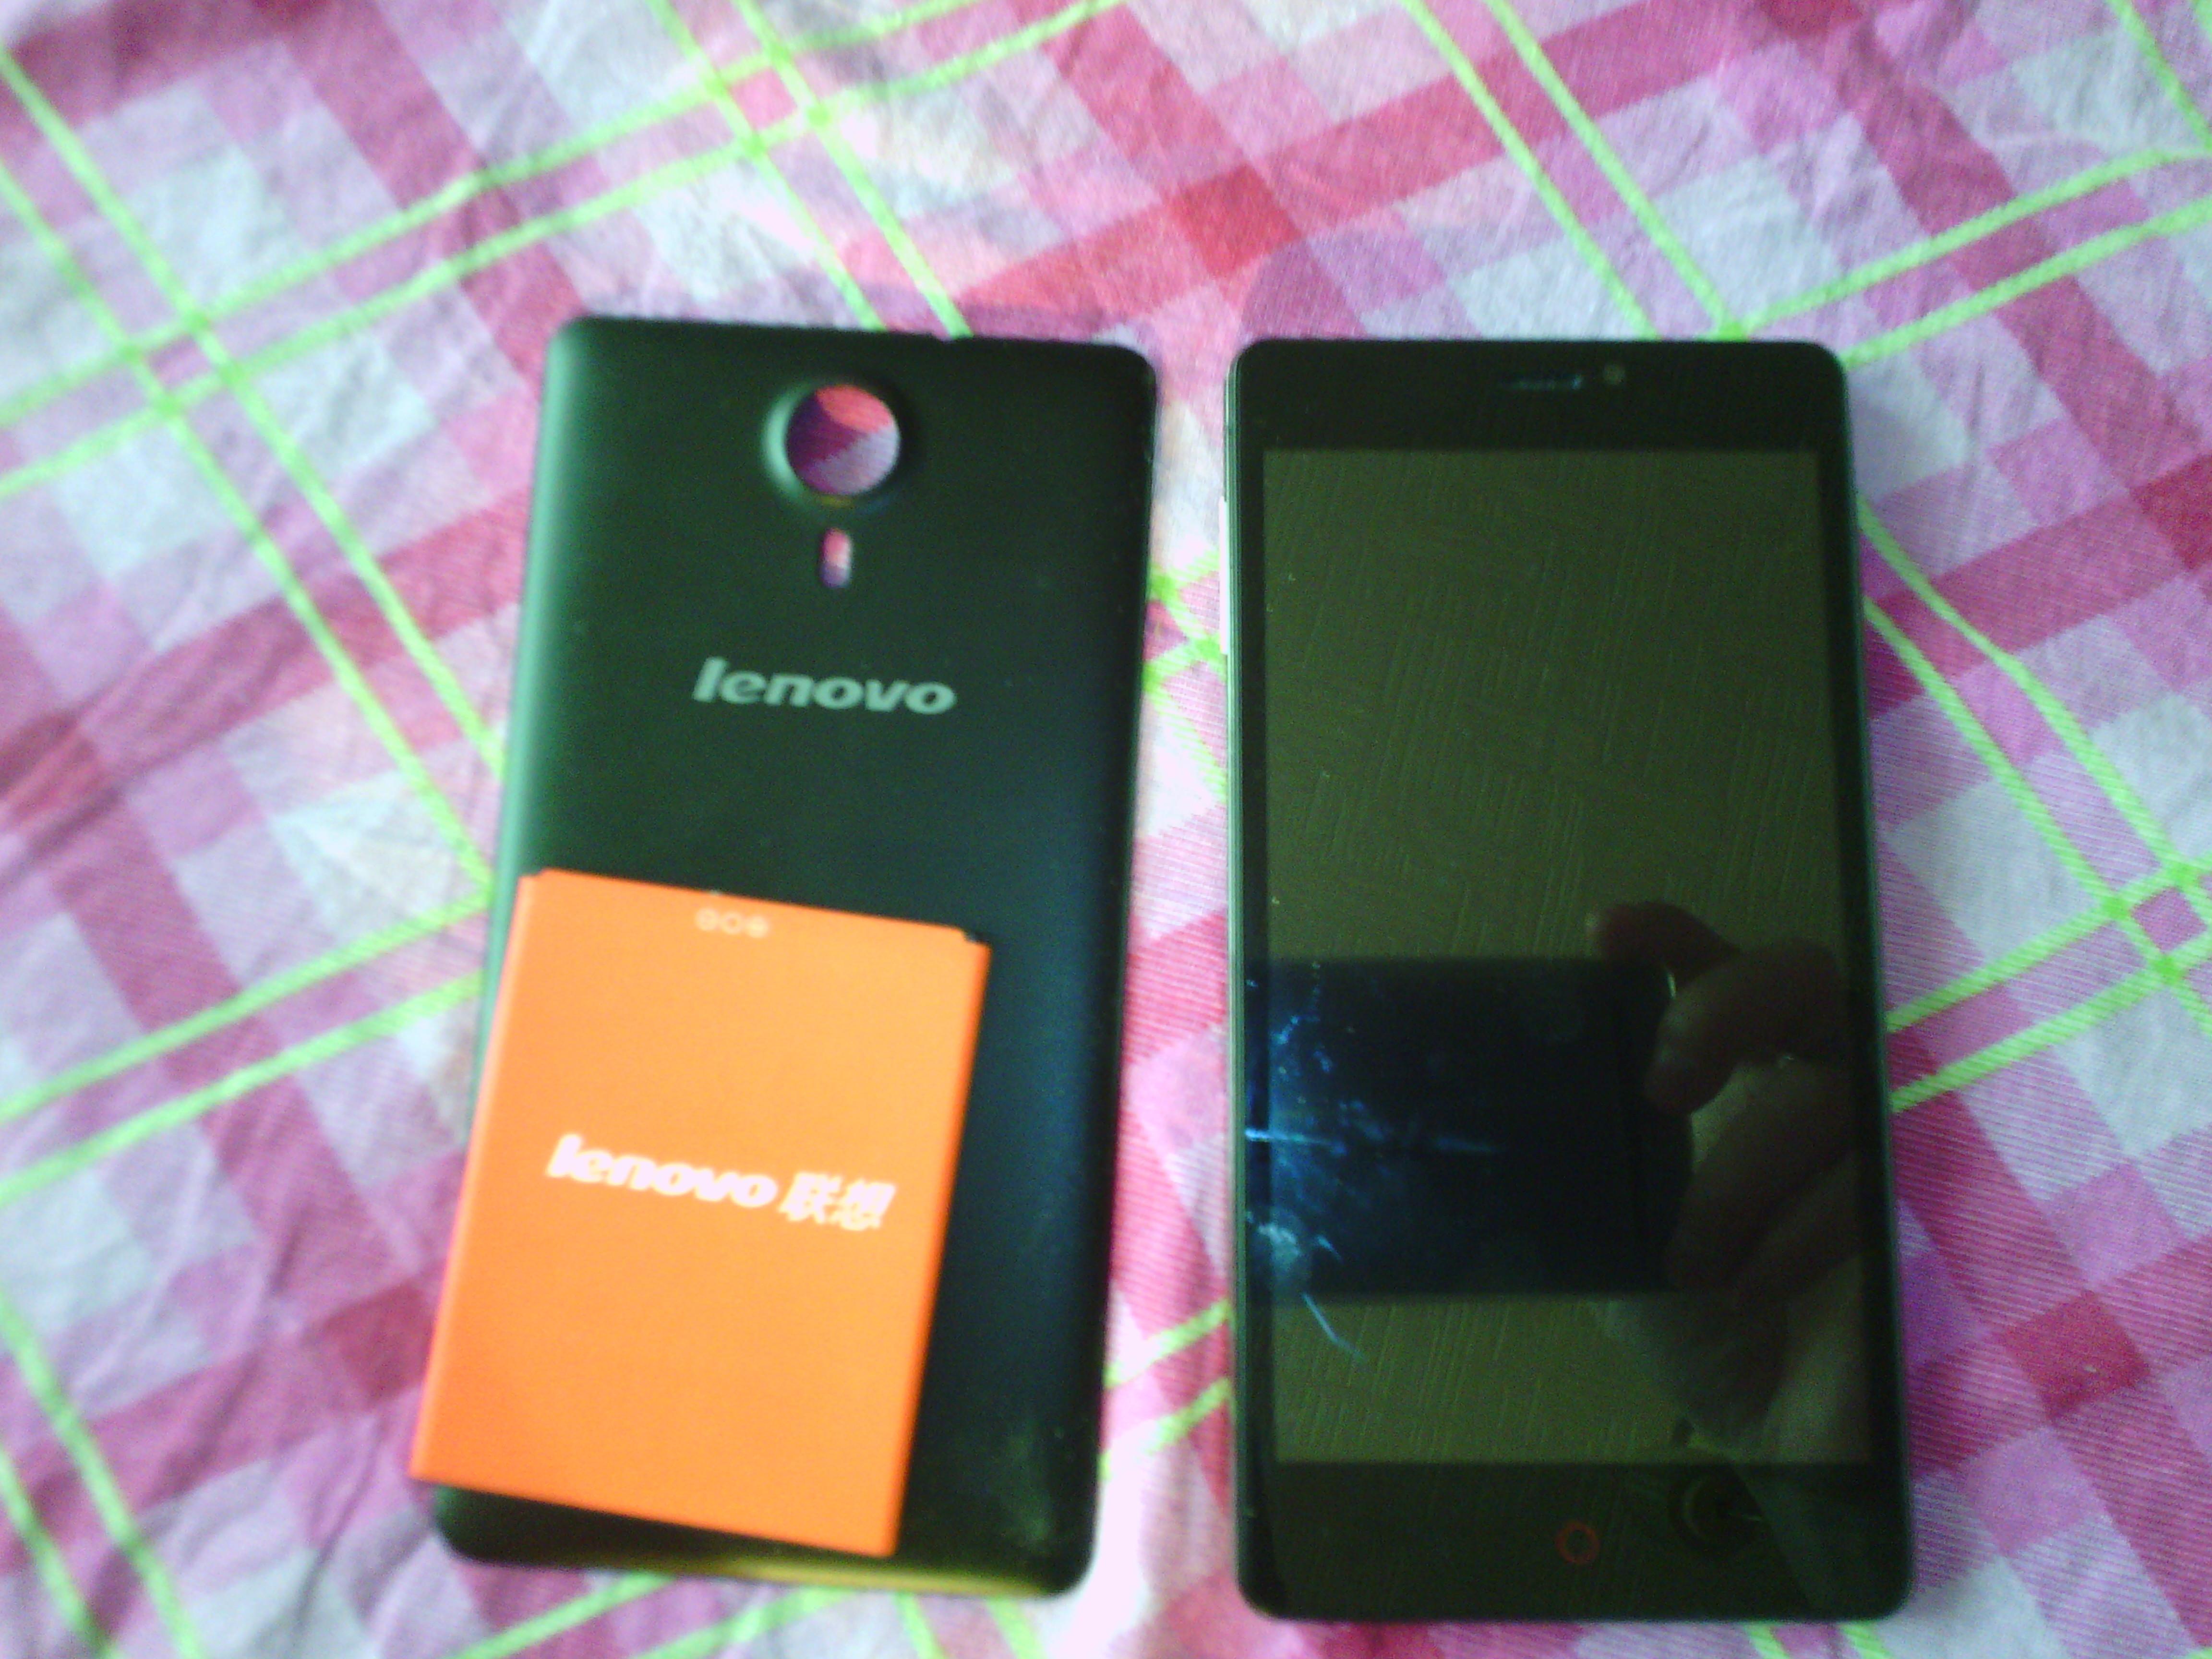 W 4G Lenovo S860t « Needrom – Mobile